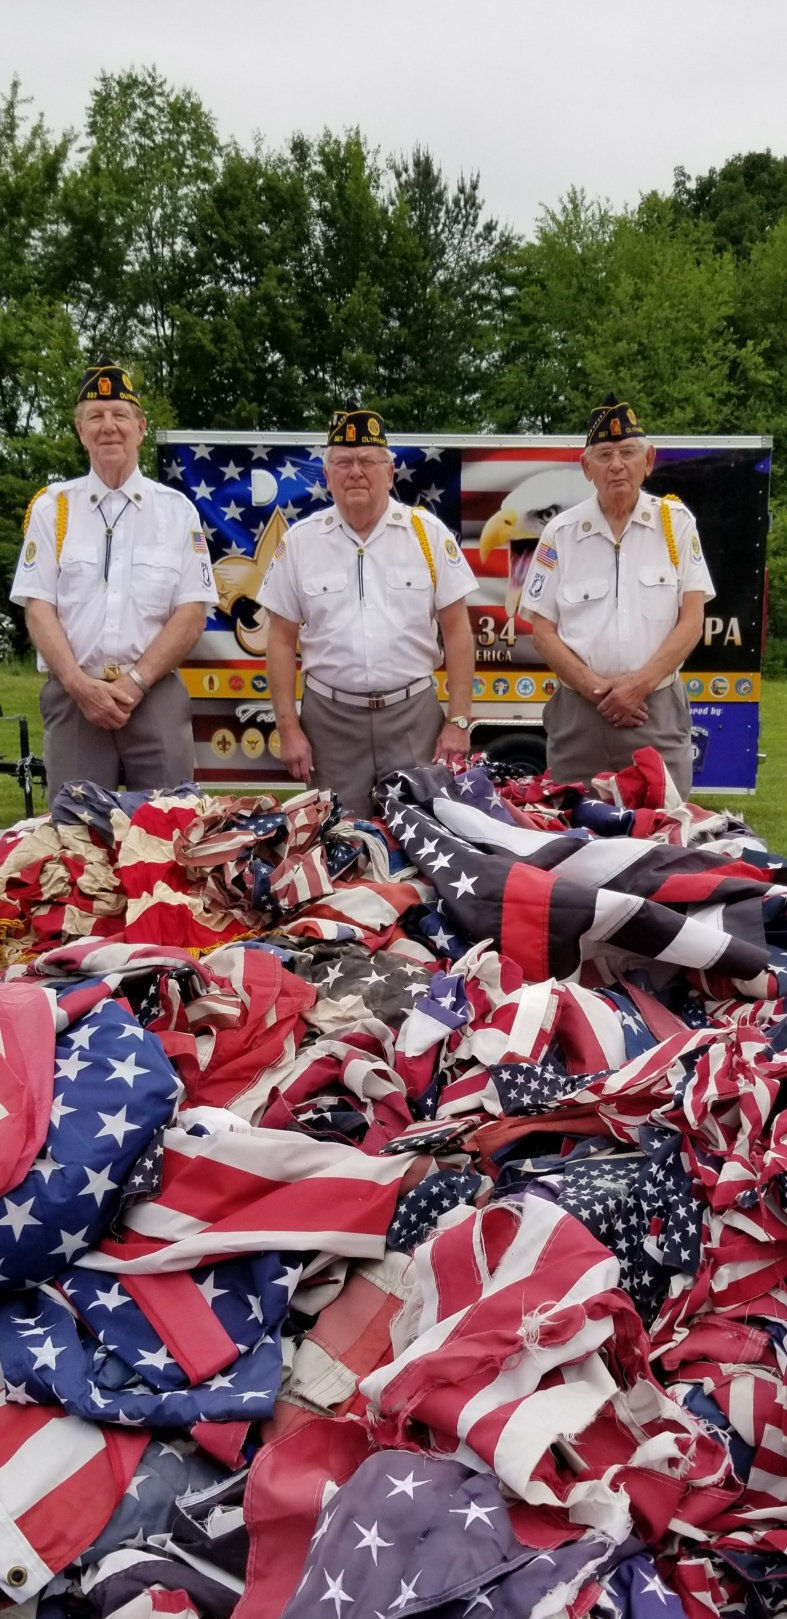 Retiring Old Glory: Boy Scouts, American Legion host solemn ceremony